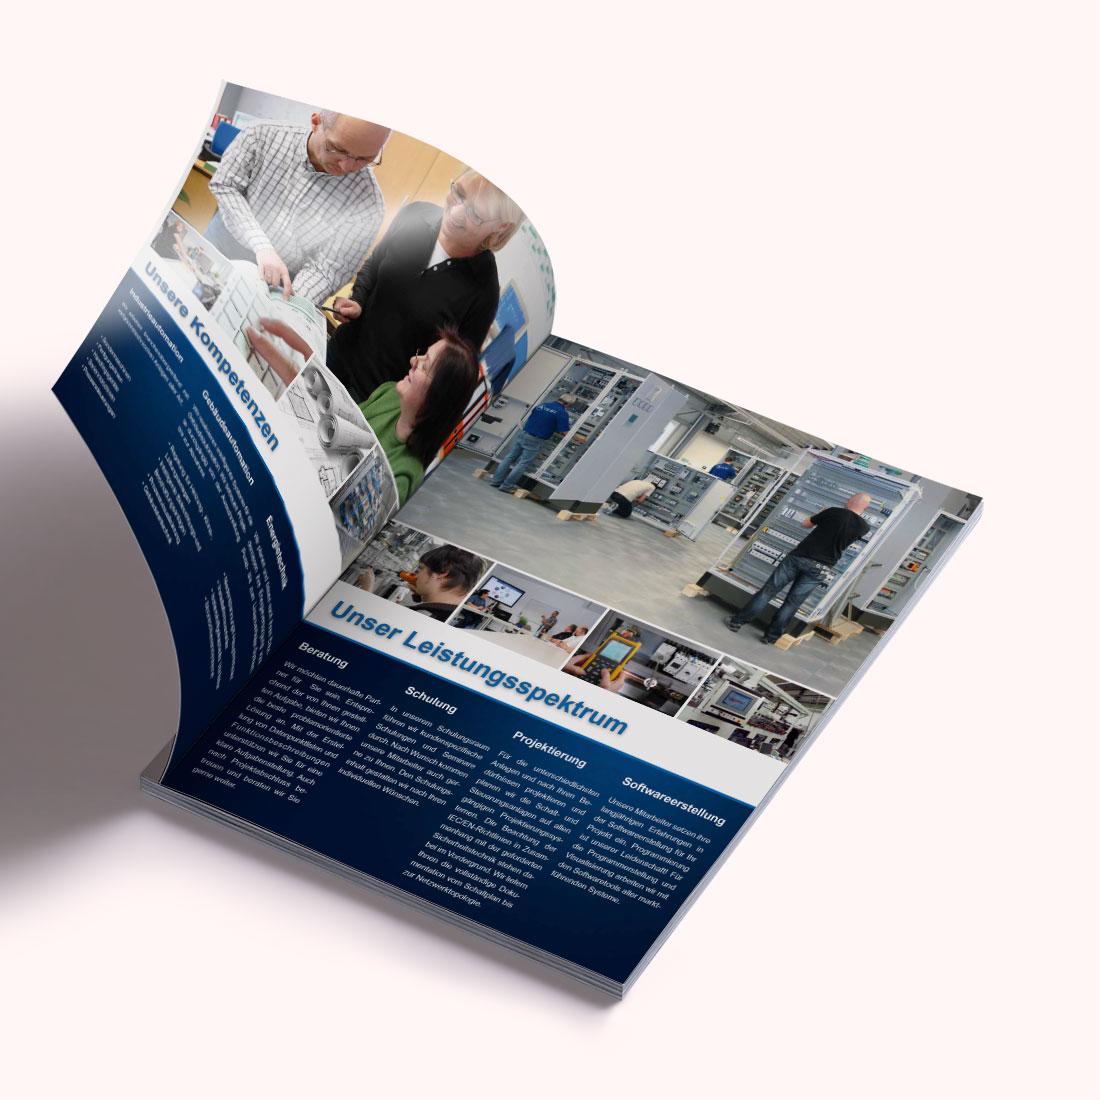 Atesi magazine